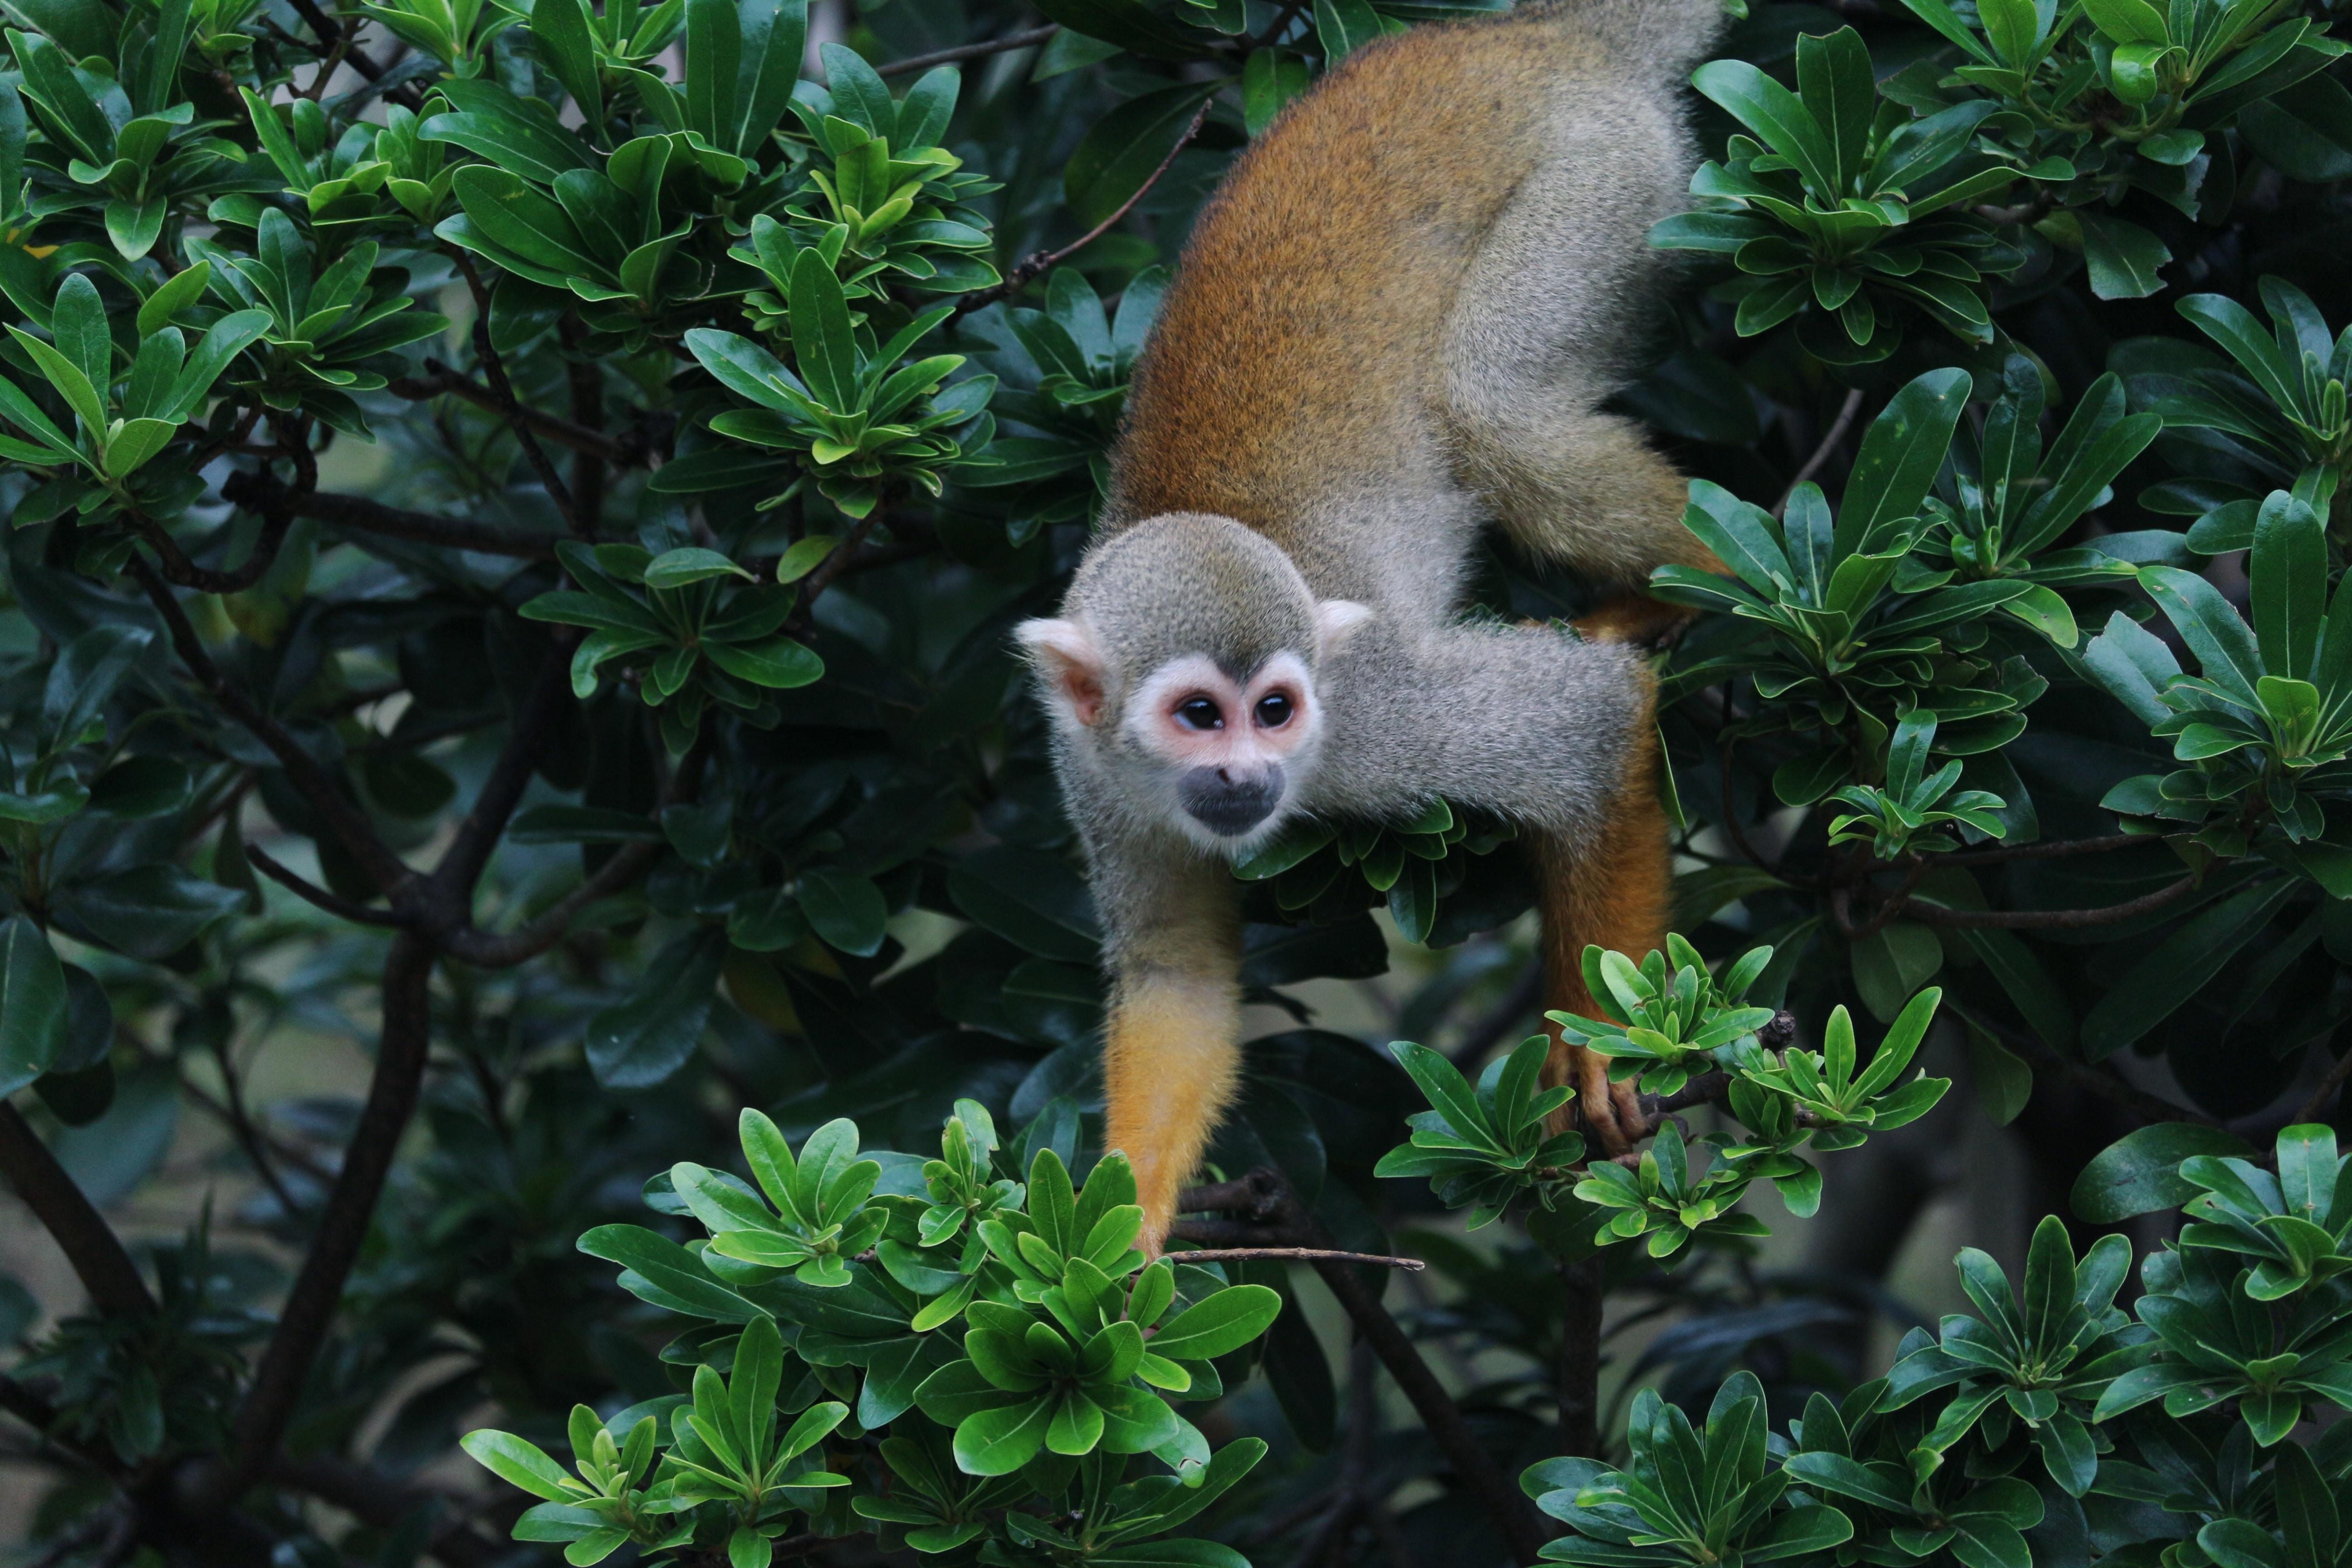 brown monkey crawling on green plants